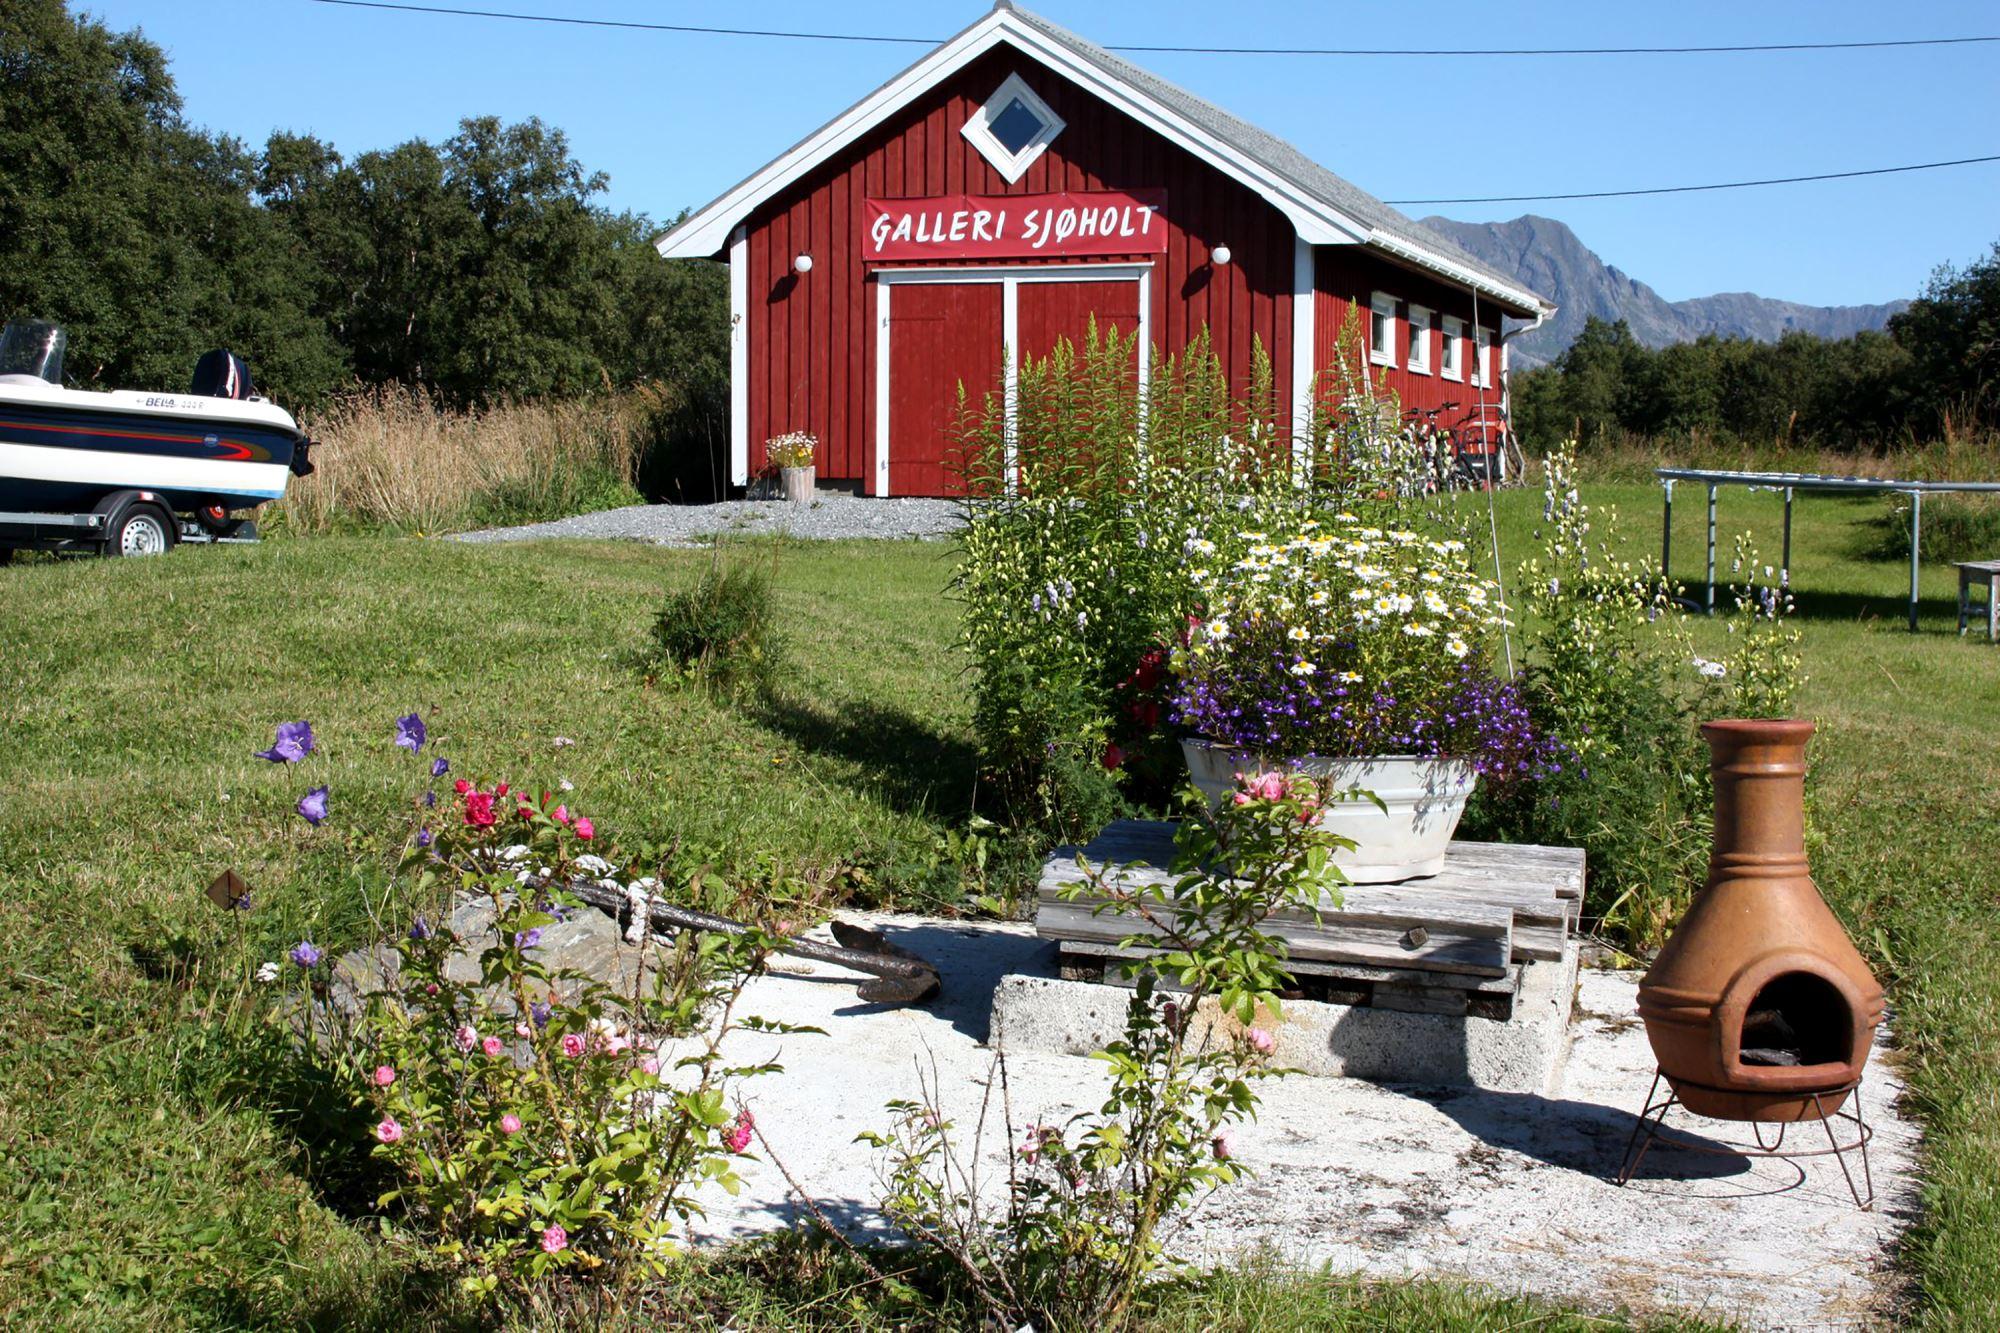 Galleri Sjøholt